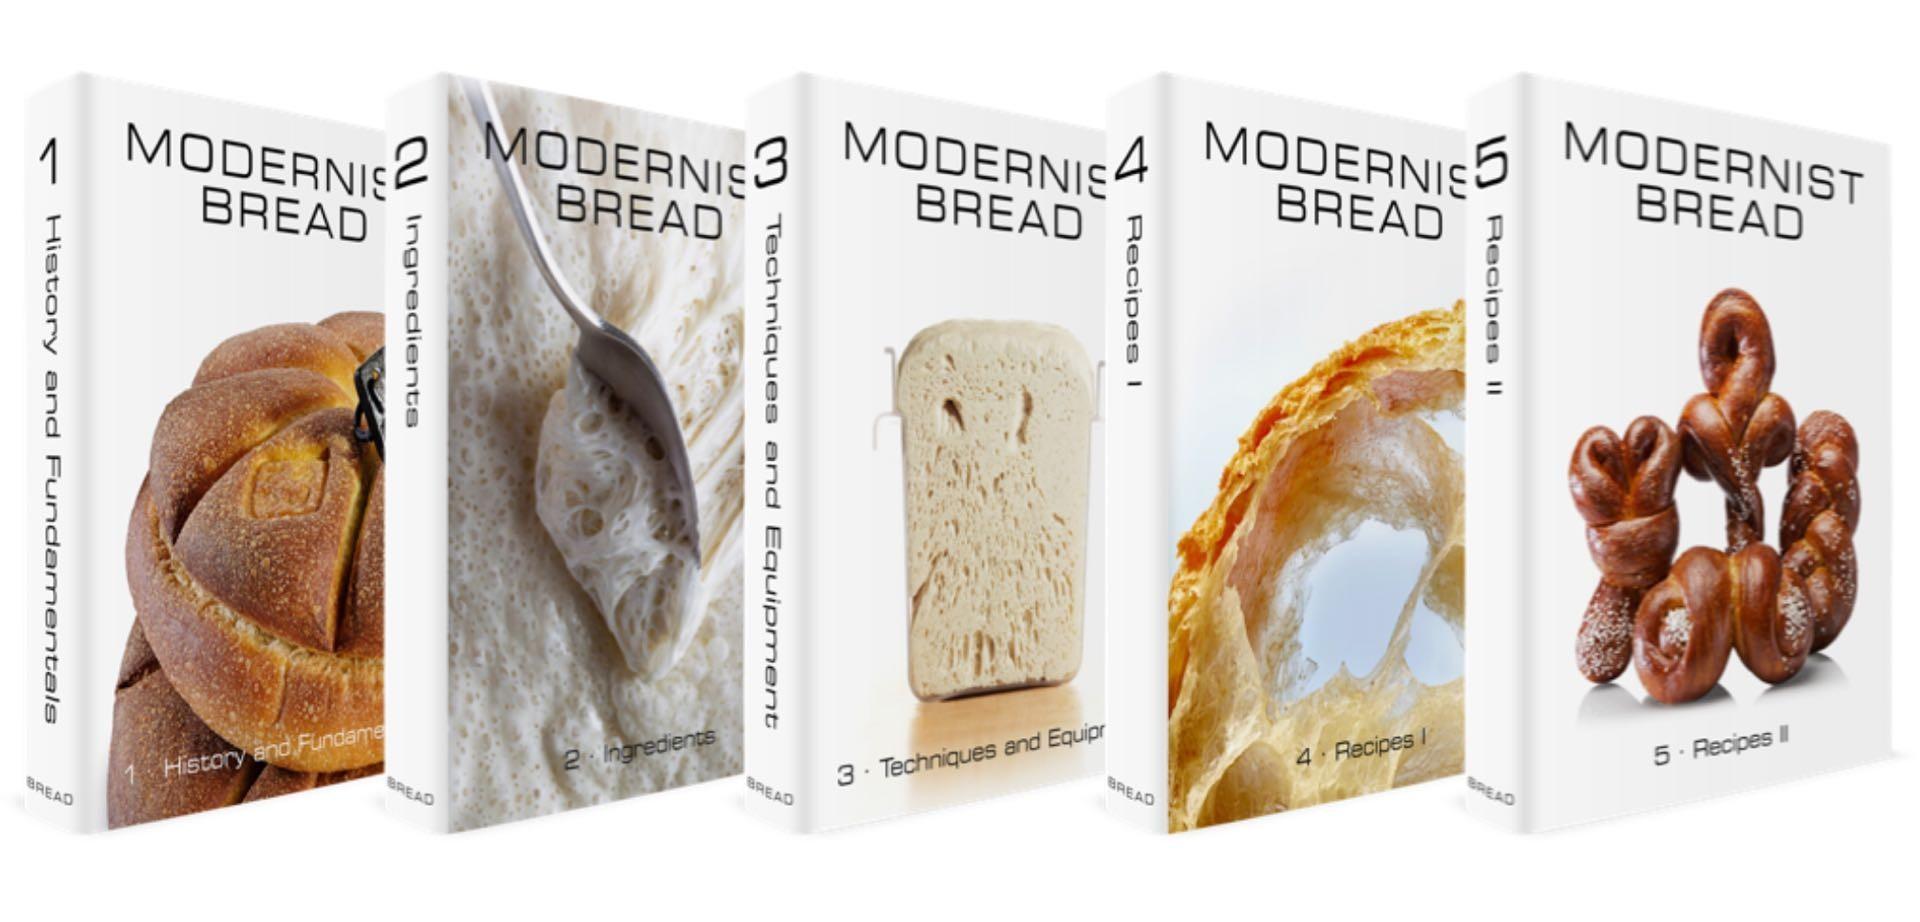 modernist-bread